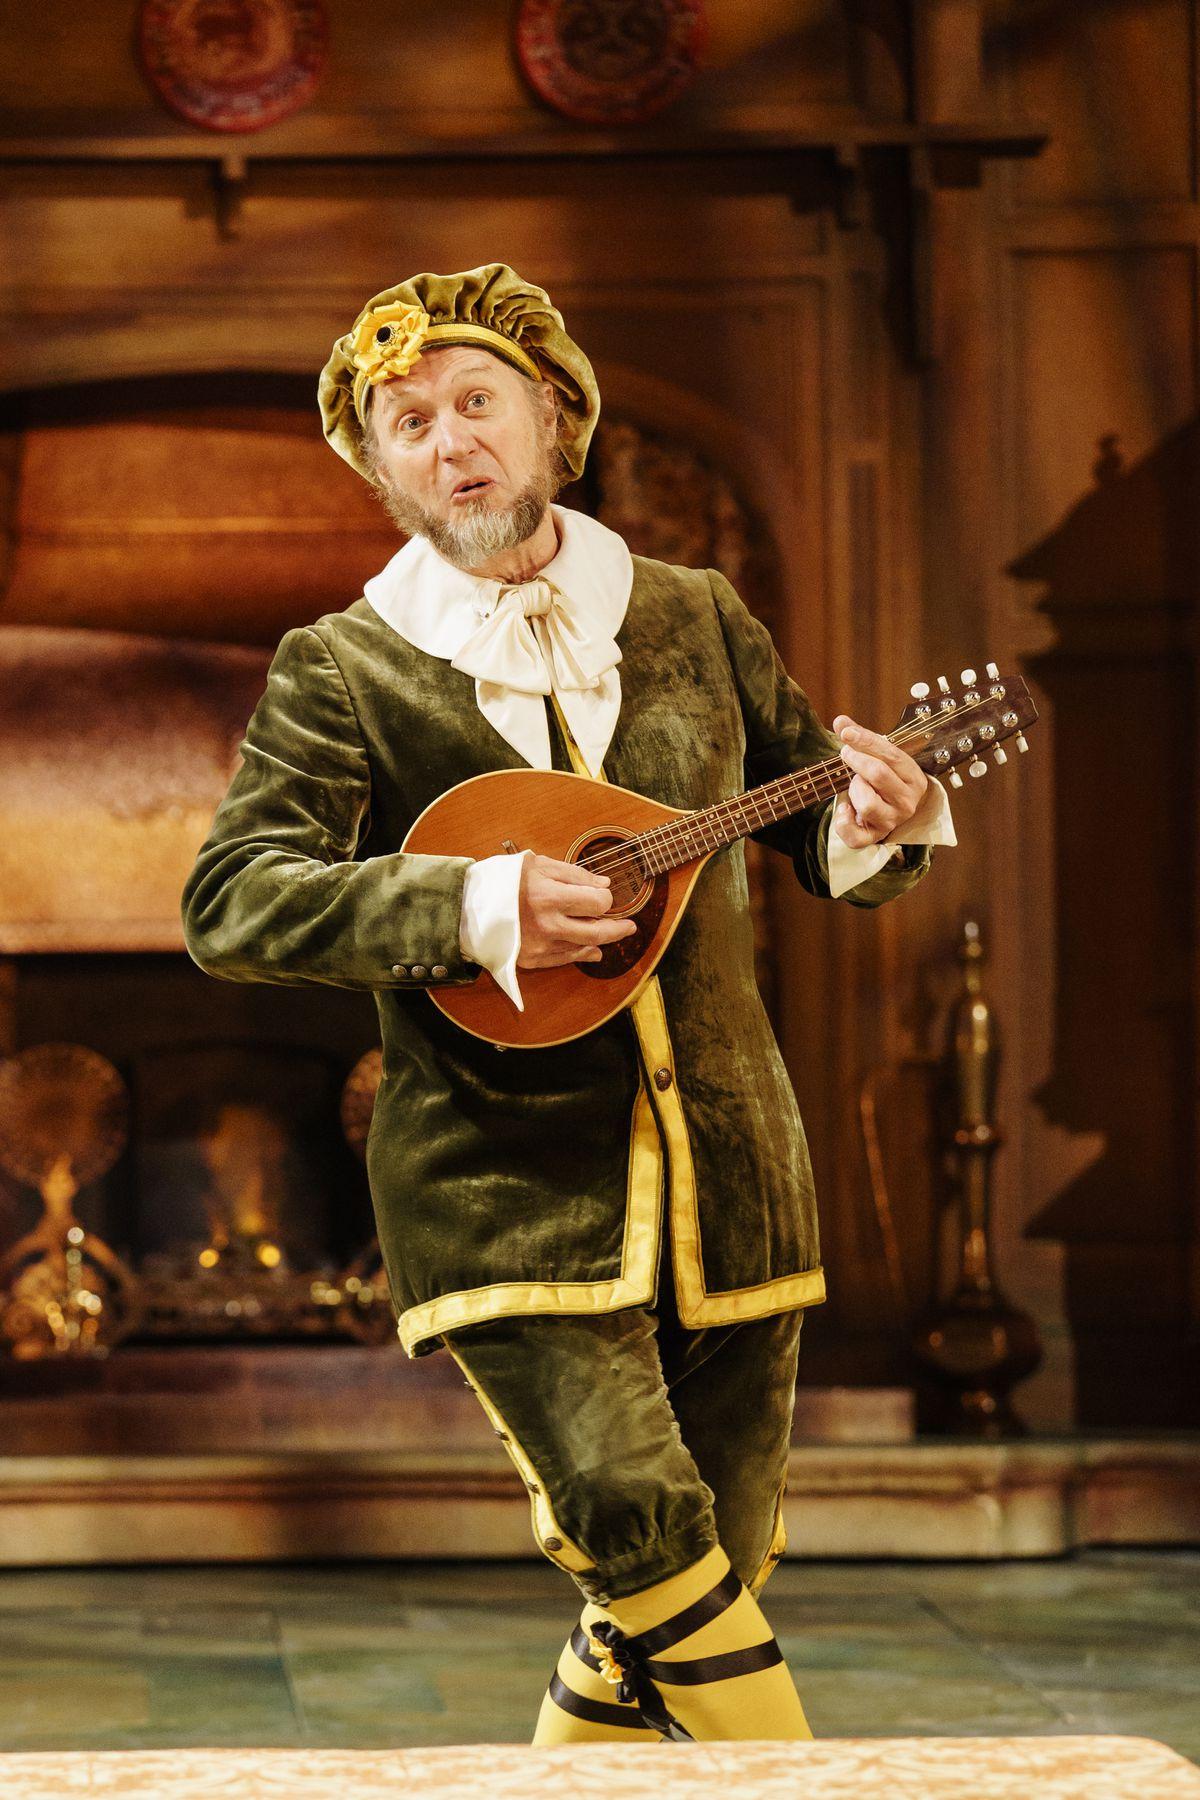 Adrian Edmondson as Malvolio. Pictures by: Manuel Harlan